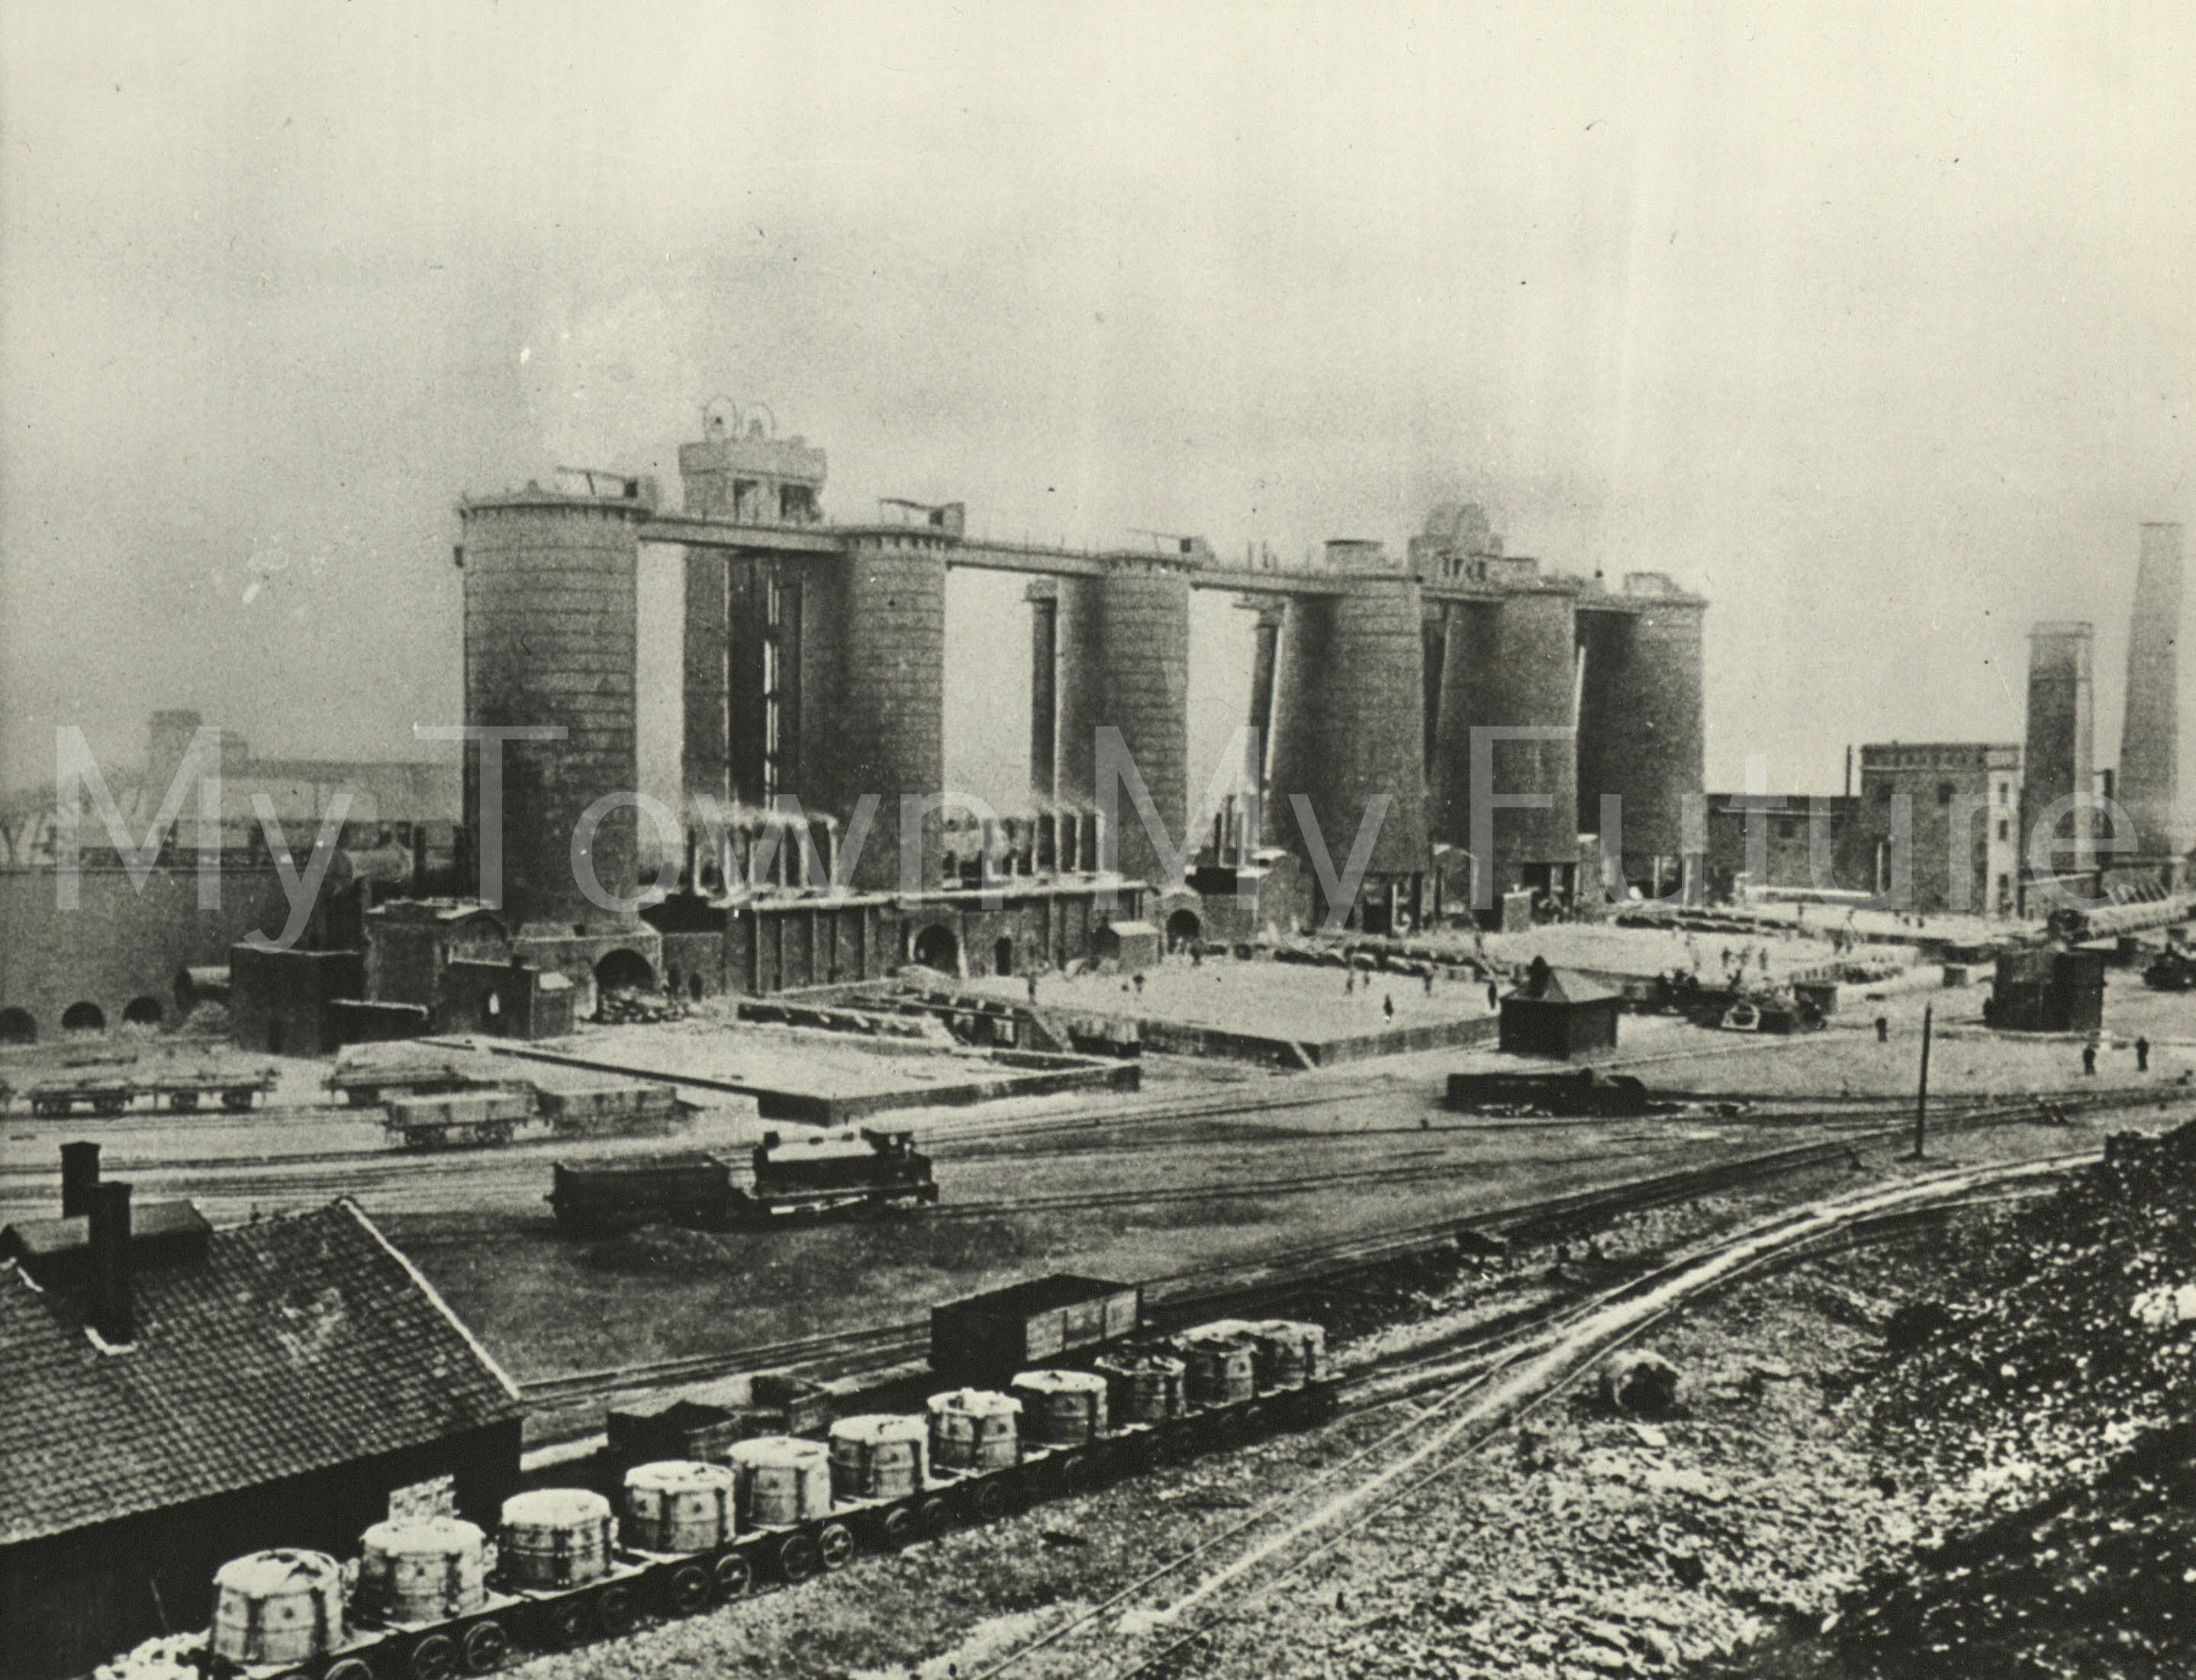 Clay Lane Ironworks 11th December 1969